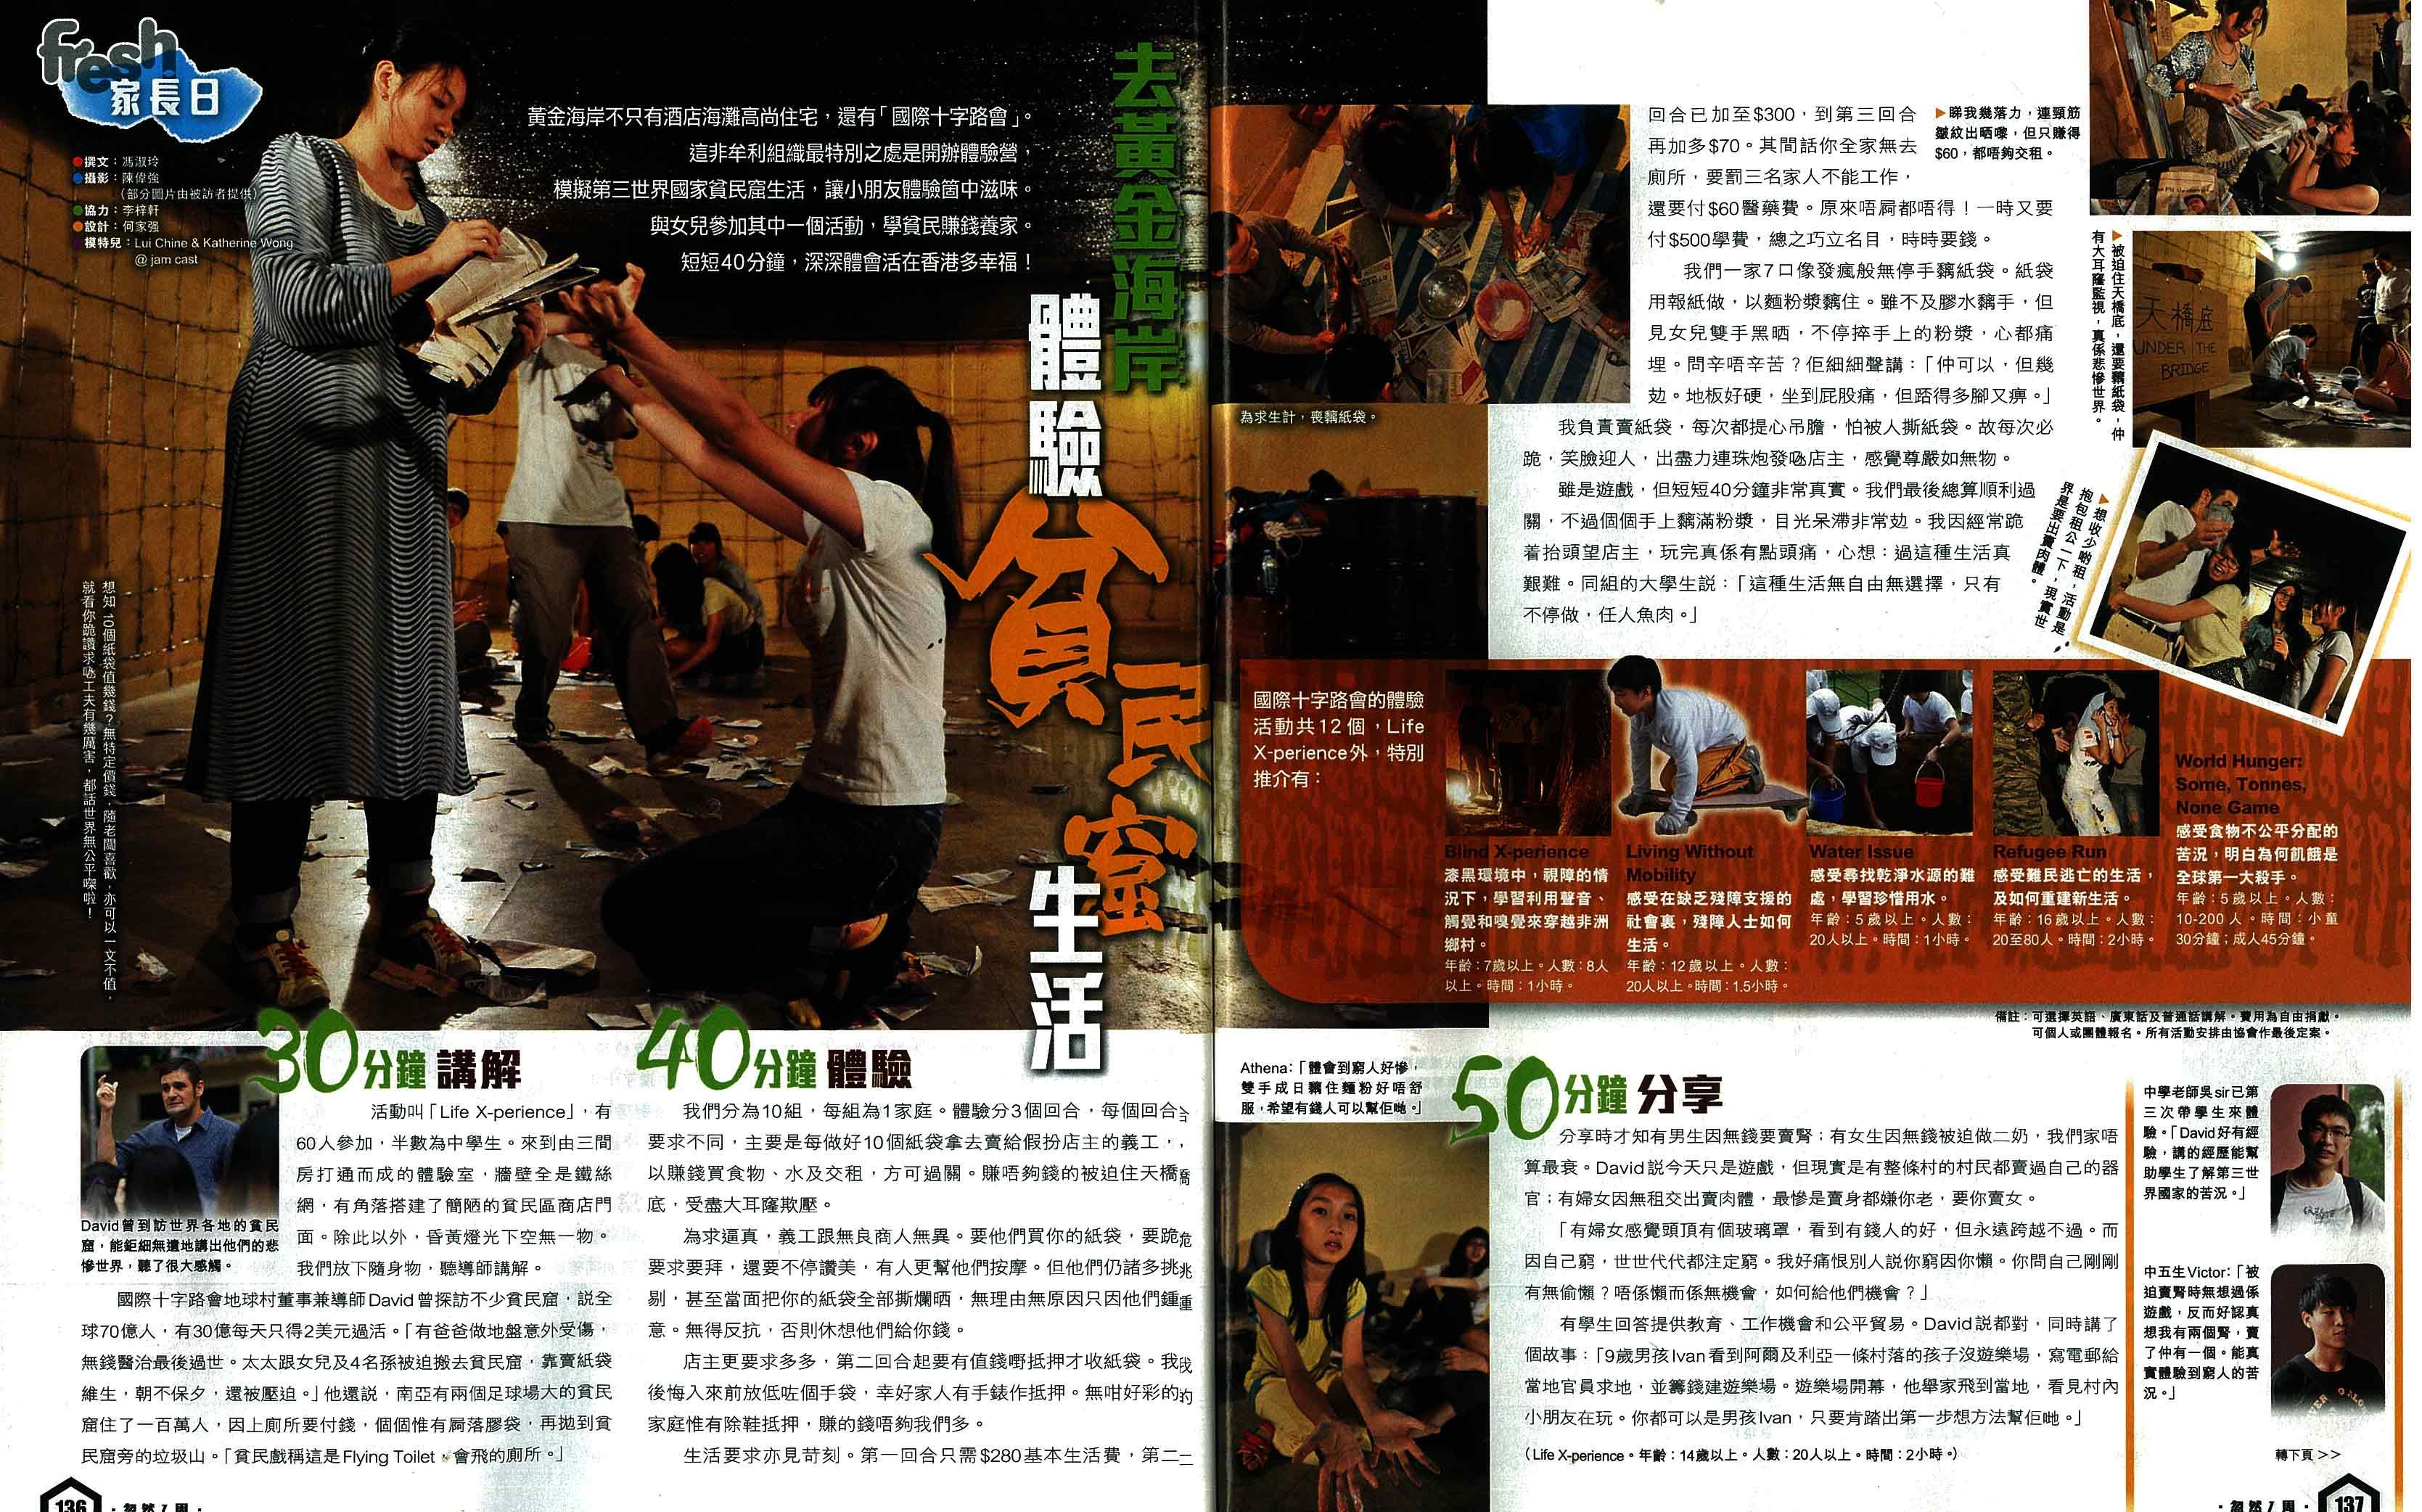 GX Aug 2013 News